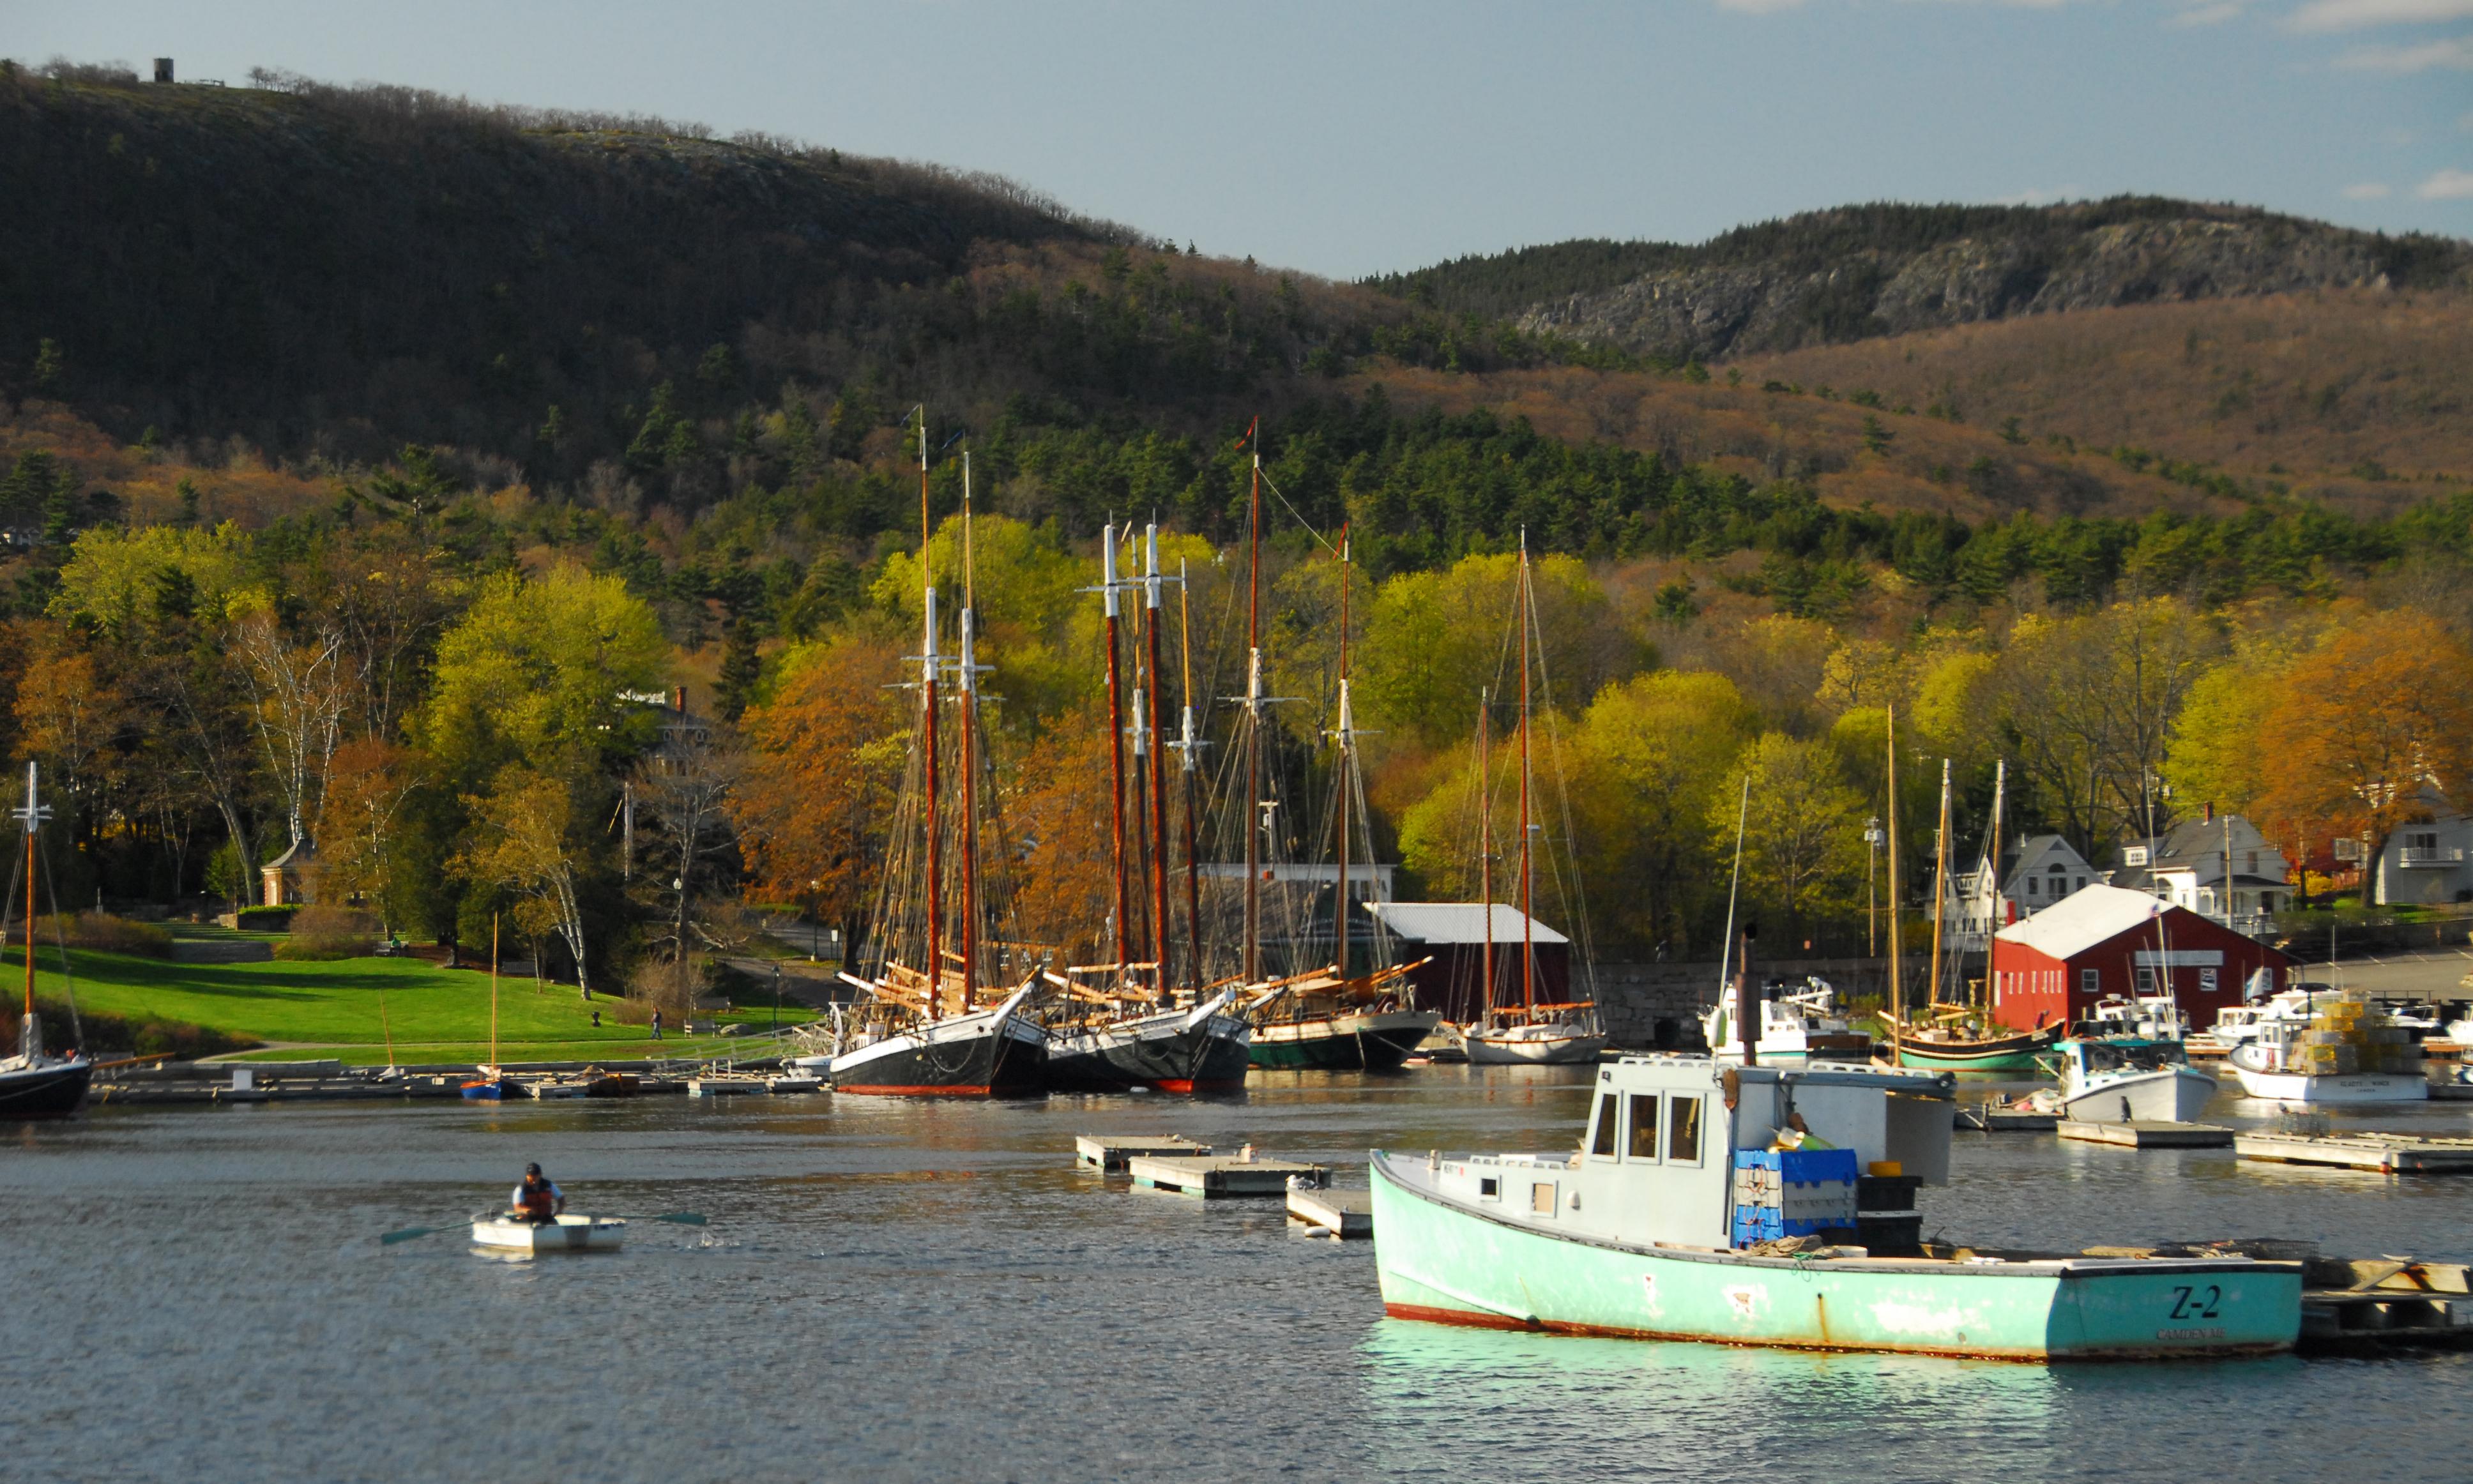 Best of Midcoast Maine and Lobsterbake